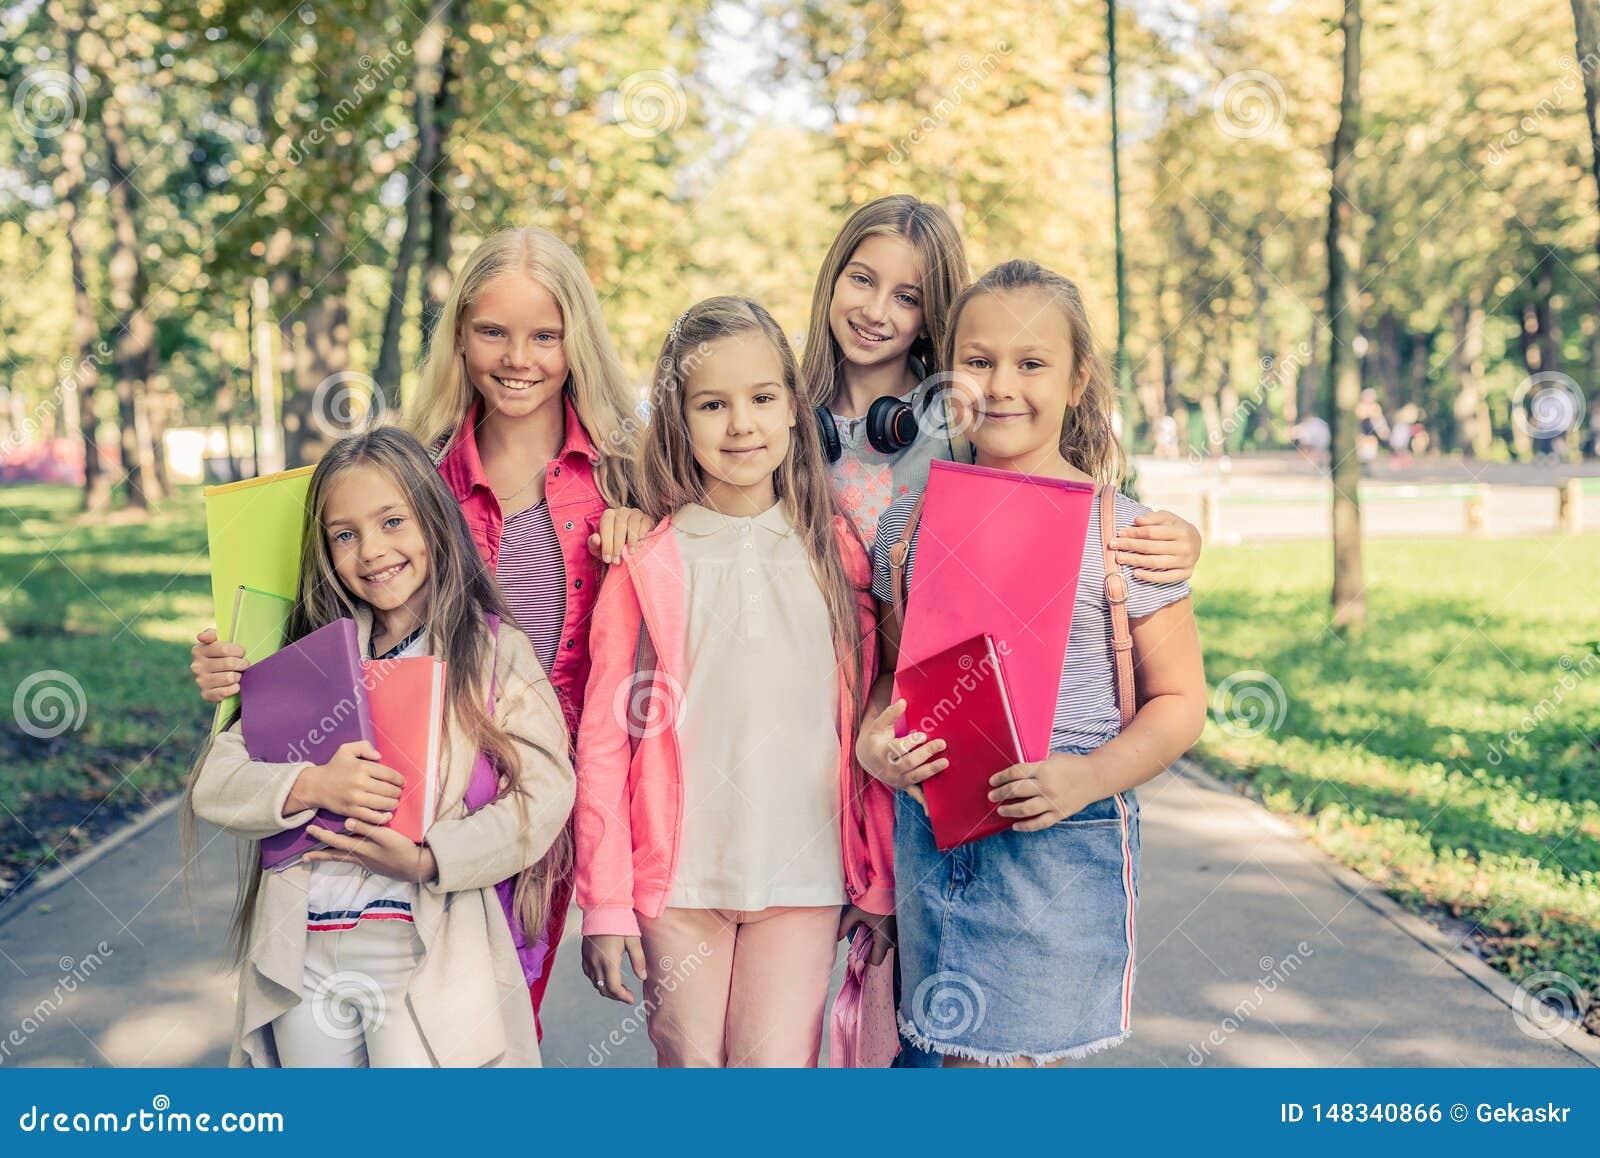 As meninas de sorriso bonitas est?o junto no parque da luz do sol